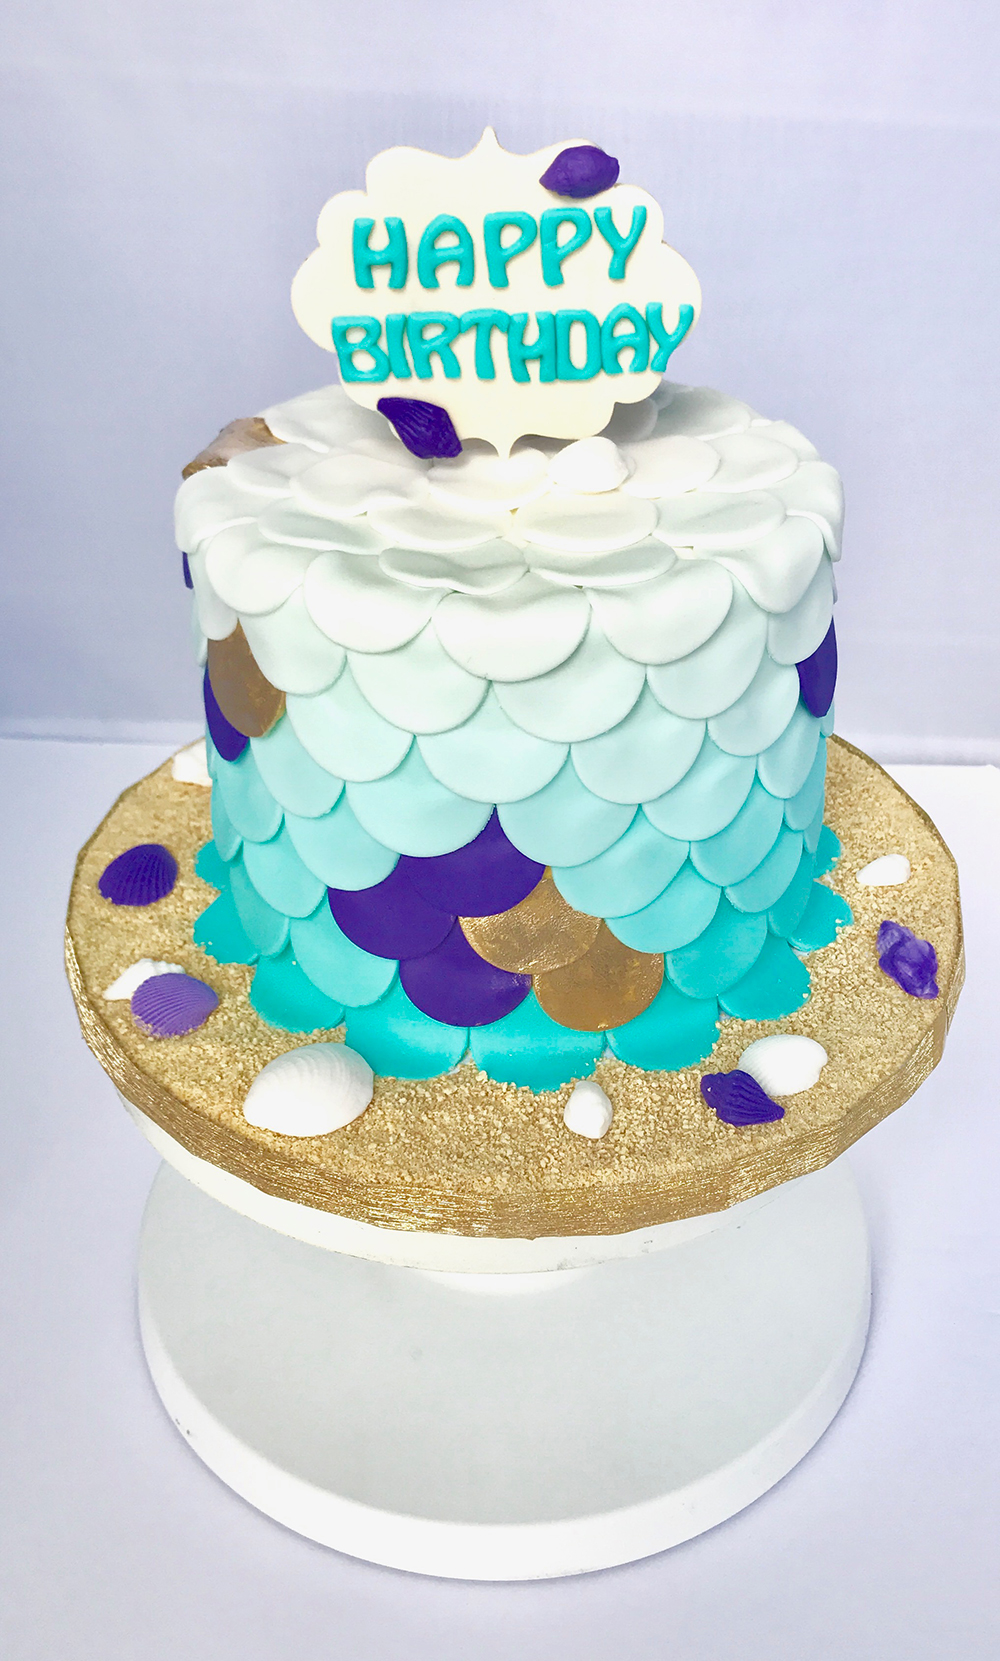 Custom Birthday Cake 3 Floor Chefnessbakery